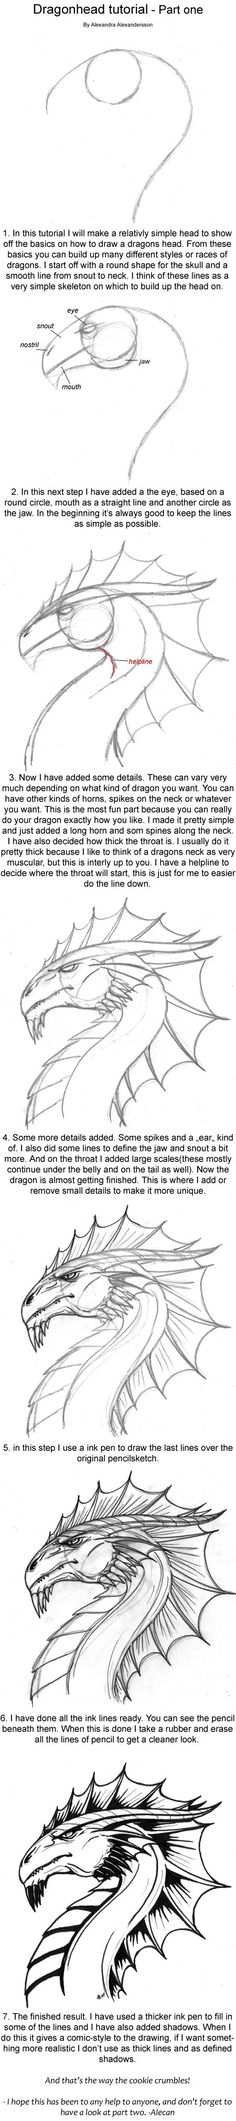 Dragonhead Tutorial part one by alecan.deviantart.com on @deviantART: